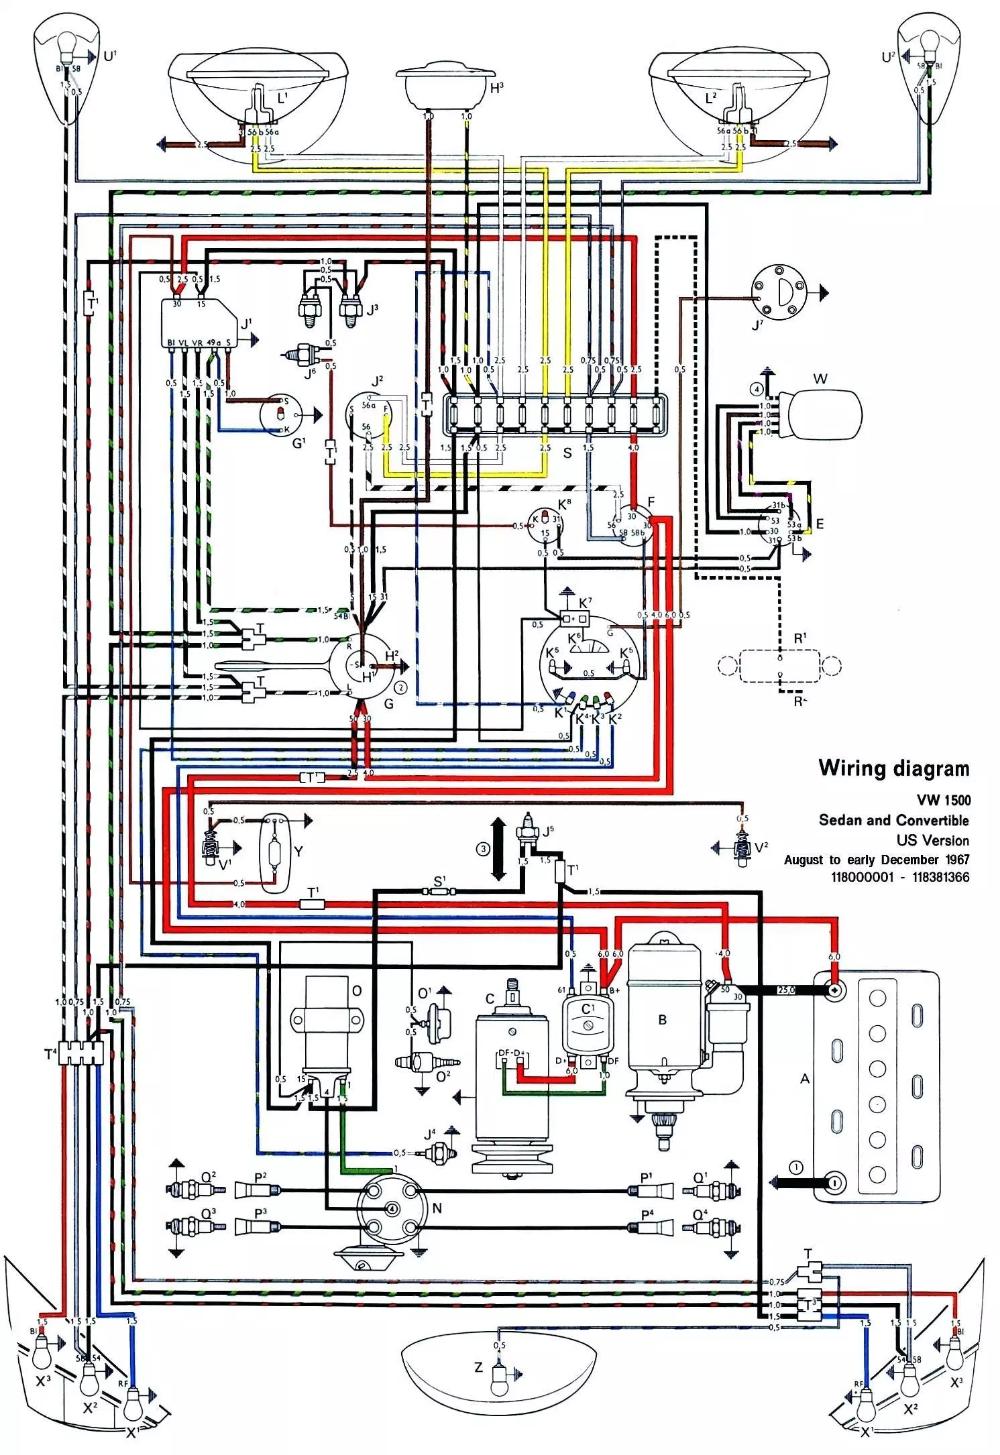 Vw Ignition Switch Wiring Diagram Google Search Electrical Diagram Electrical Wiring Diagram Diagram